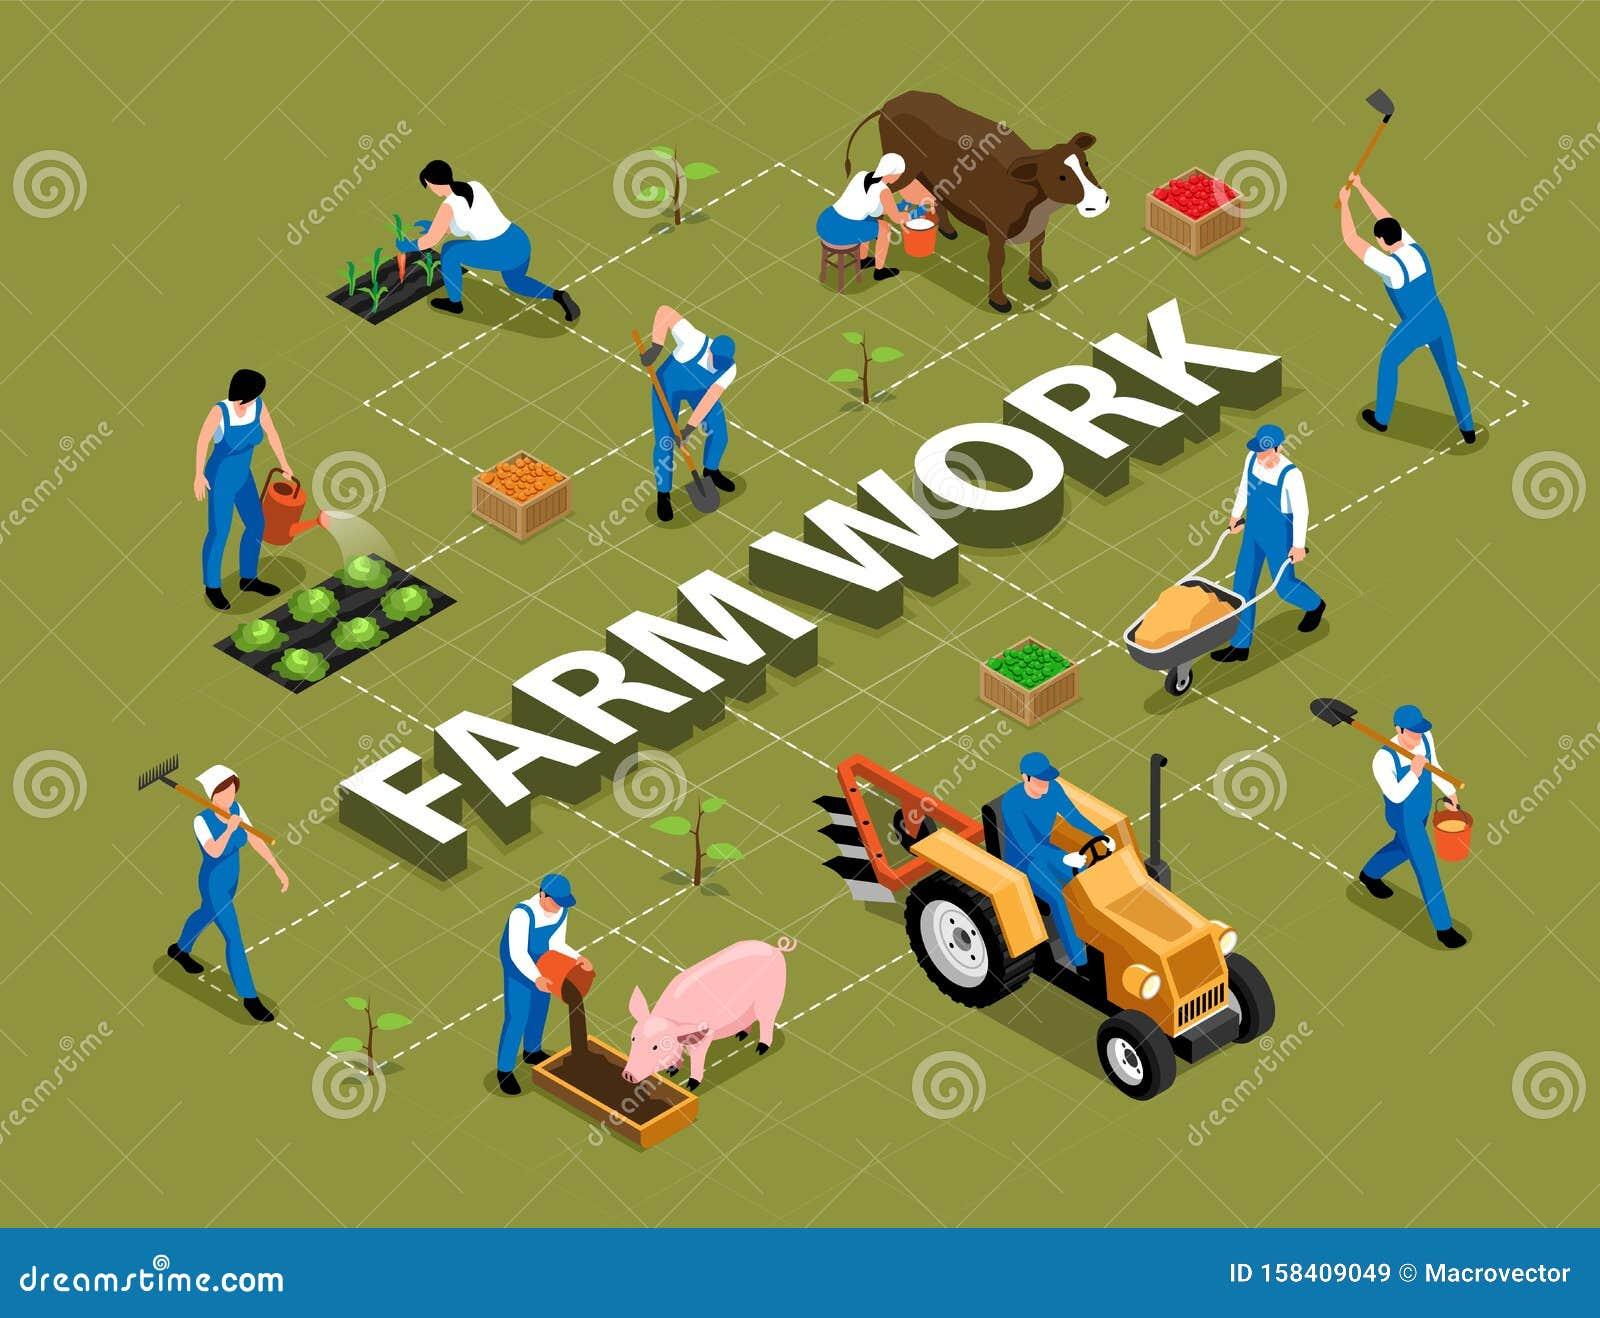 Farm Work Isometric Flowchart